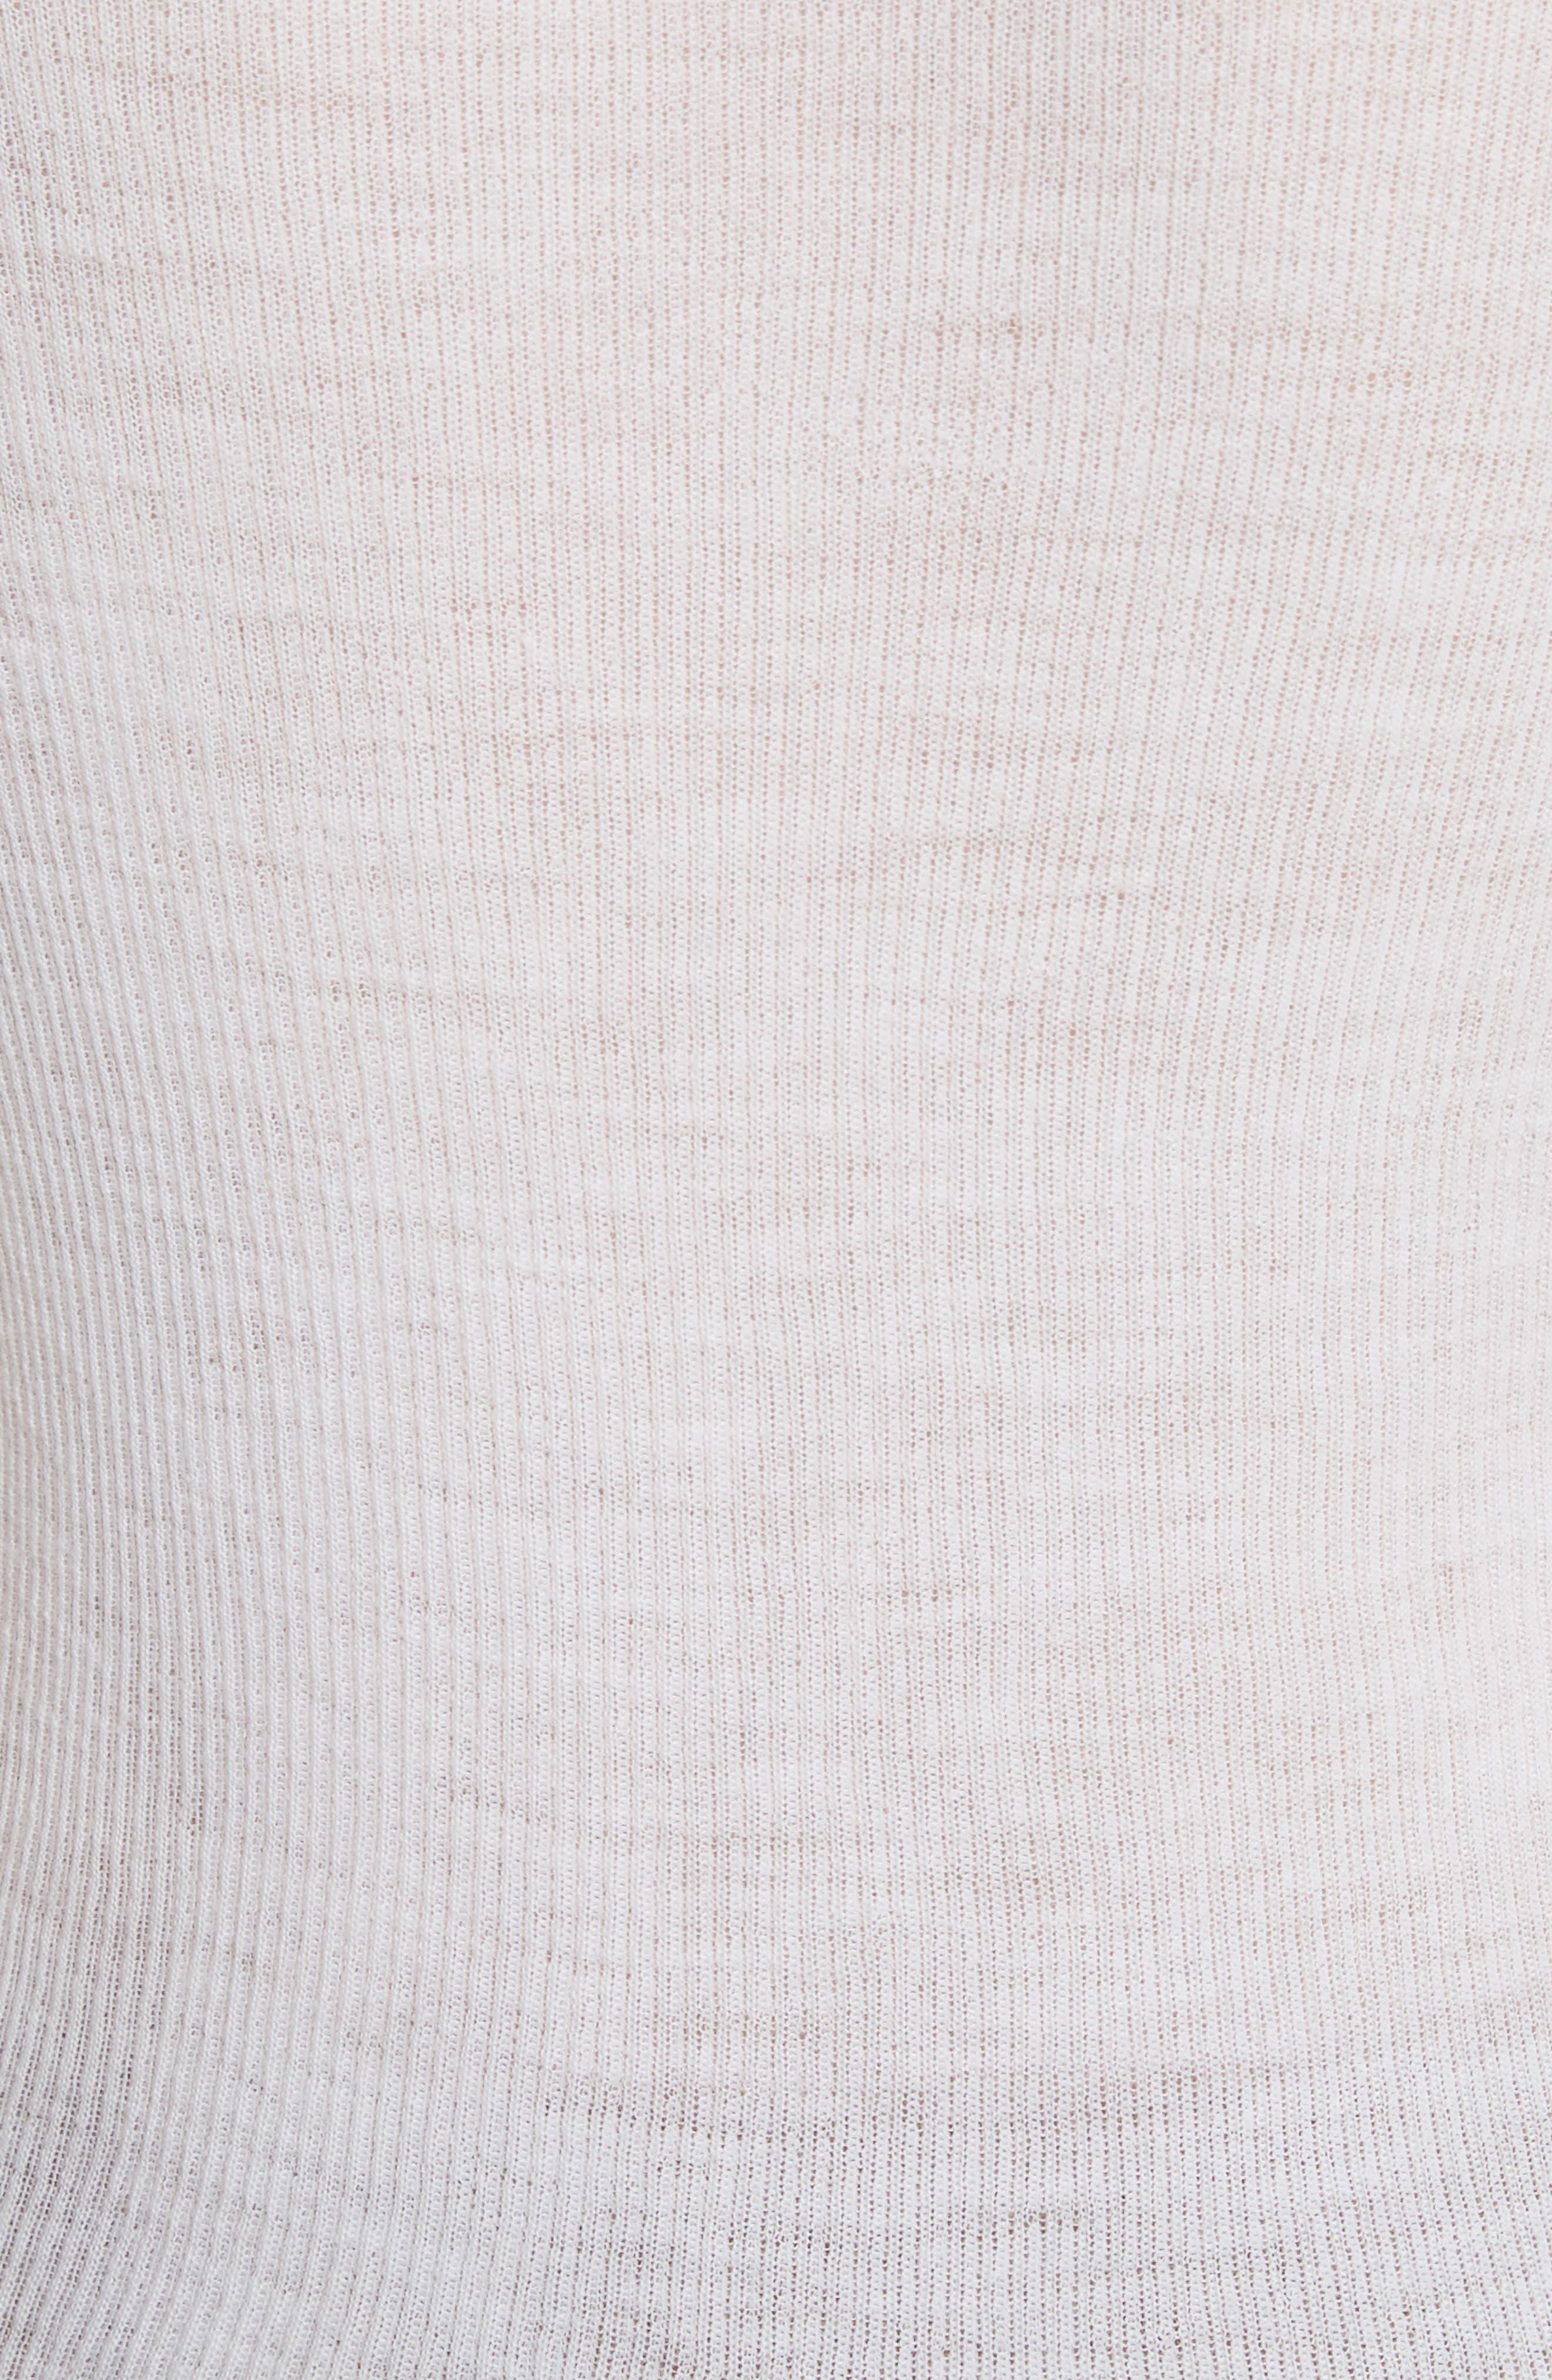 Stripe Cuff Wool Sweater,                             Alternate thumbnail 5, color,                             170